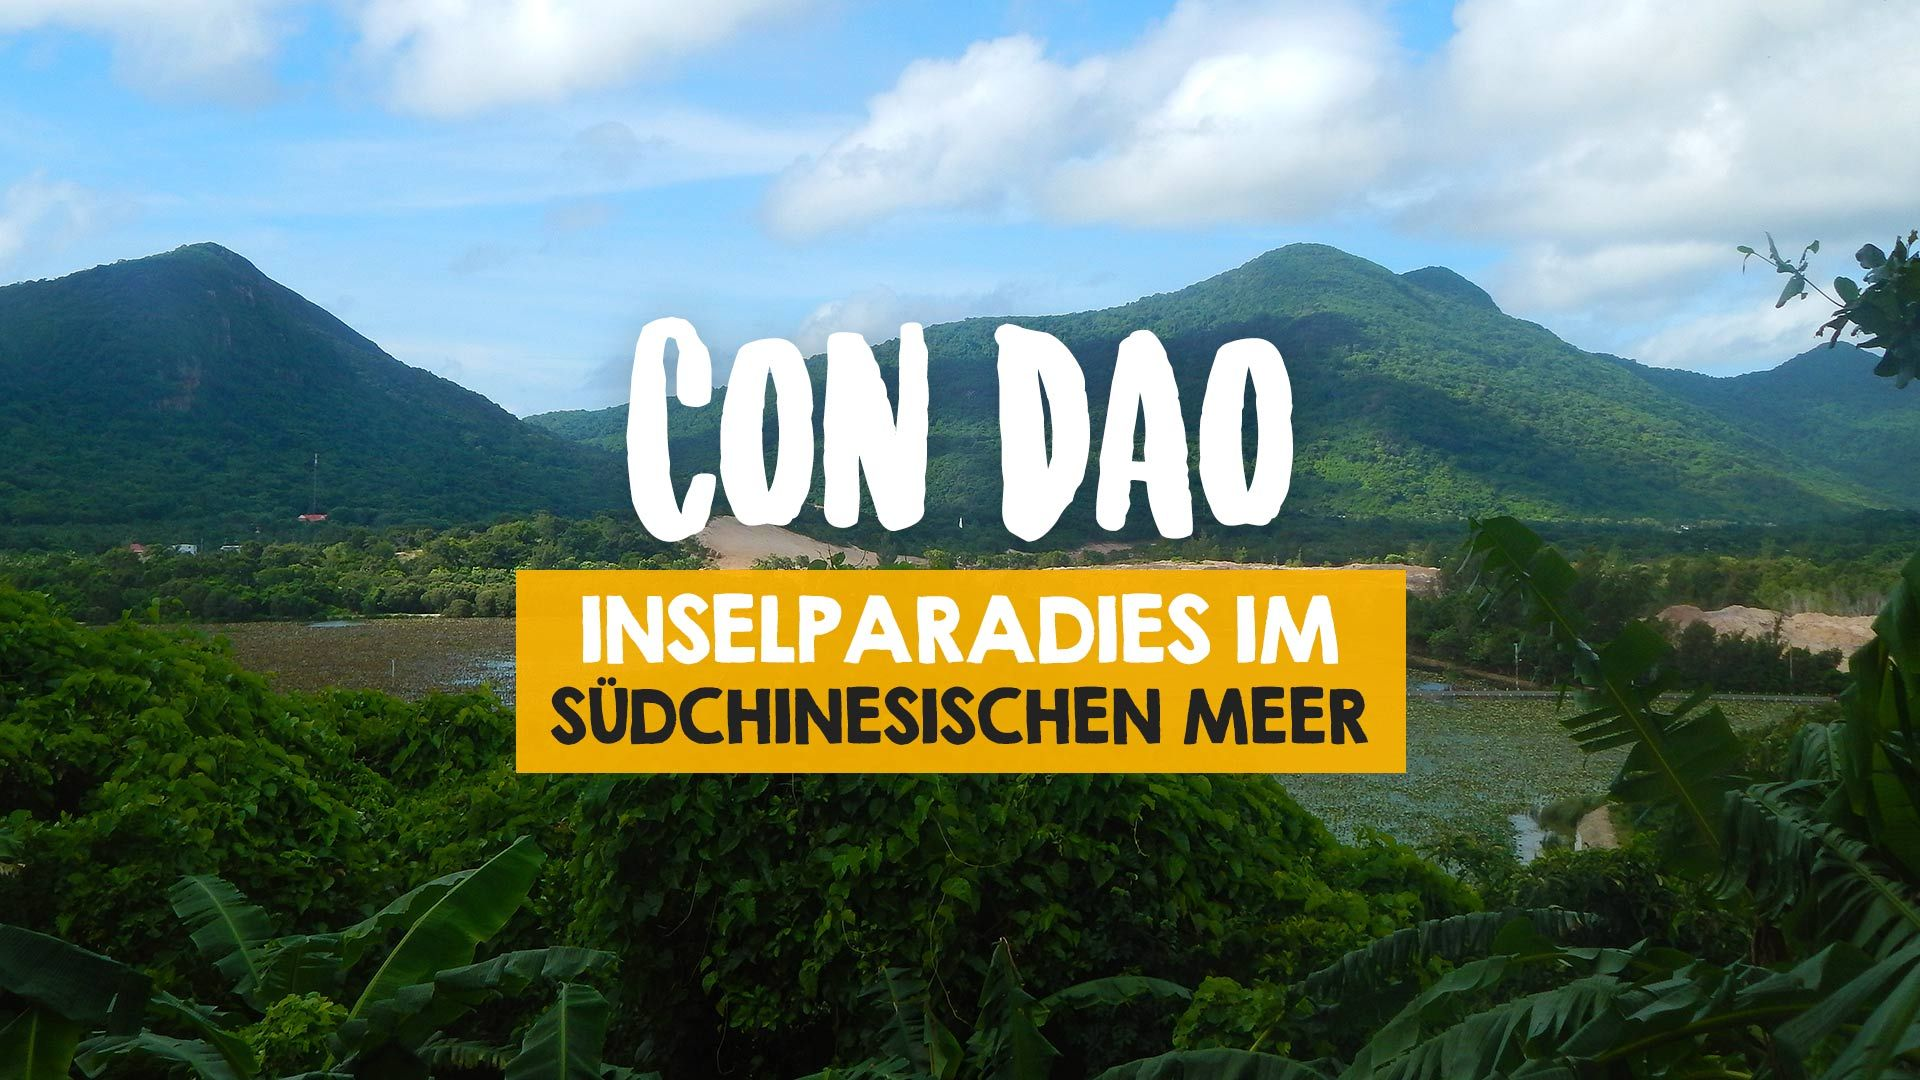 share silvester single party 2013 oldenburg phrase Completely share